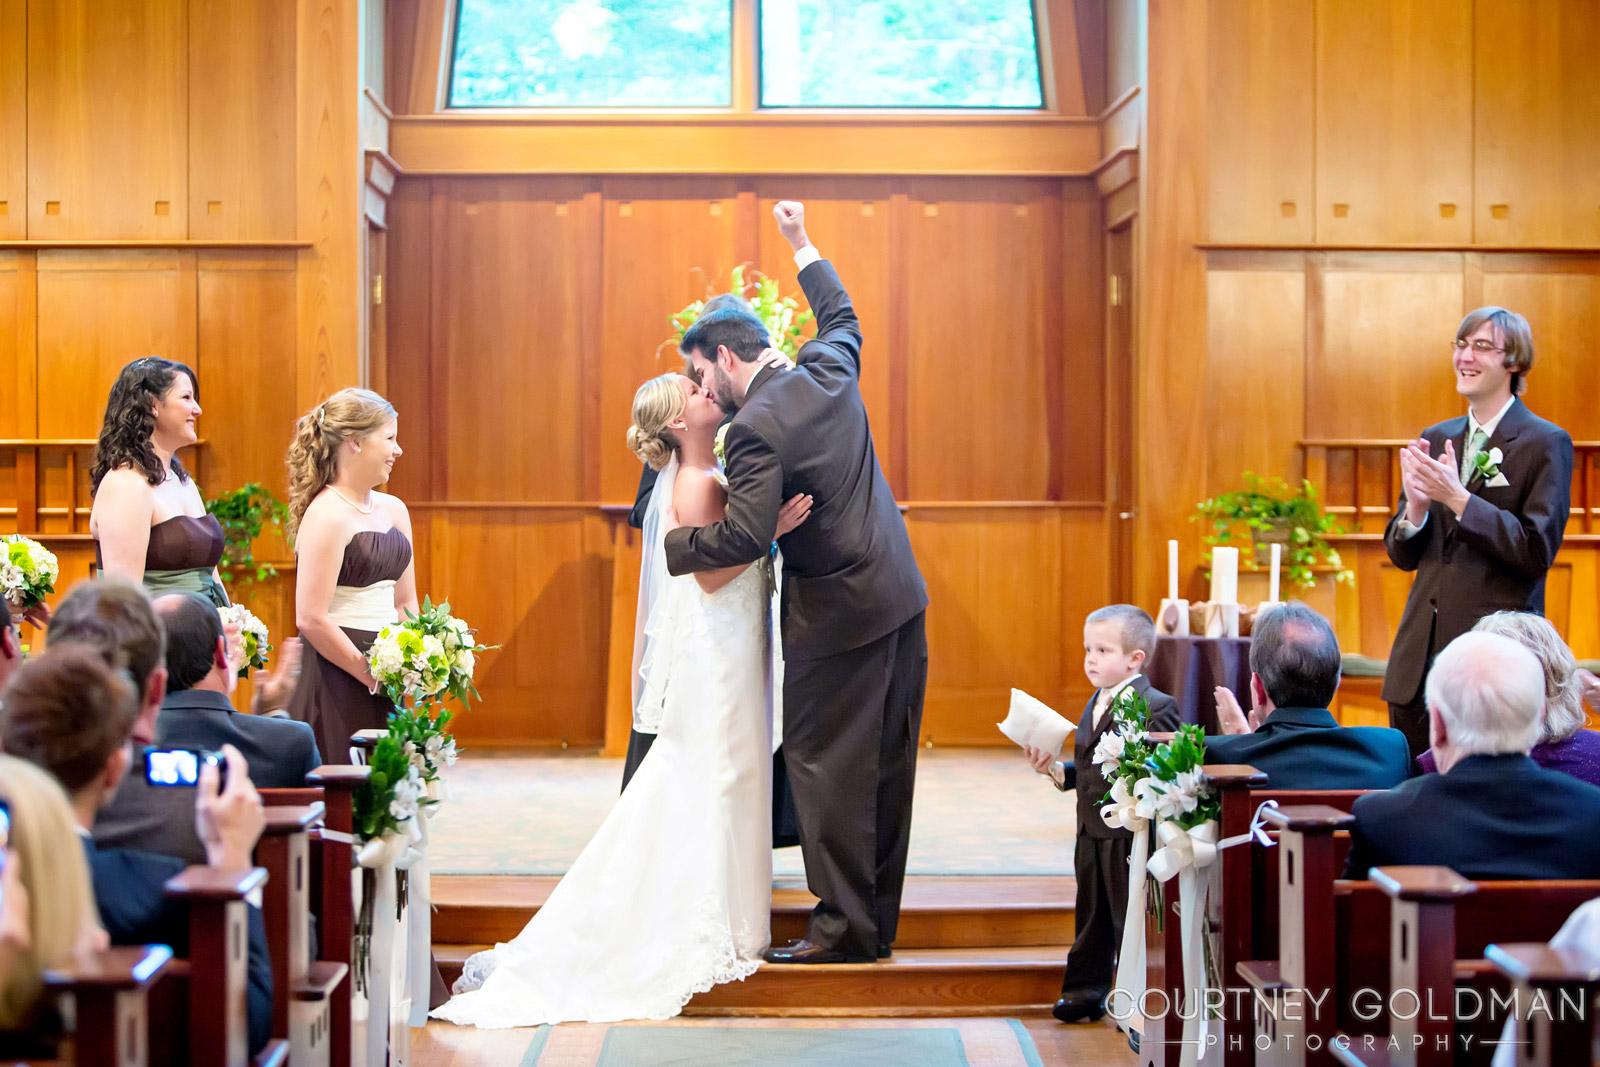 Atlanta-Wedding-Photography-by-Courtney-Goldman-61.jpg